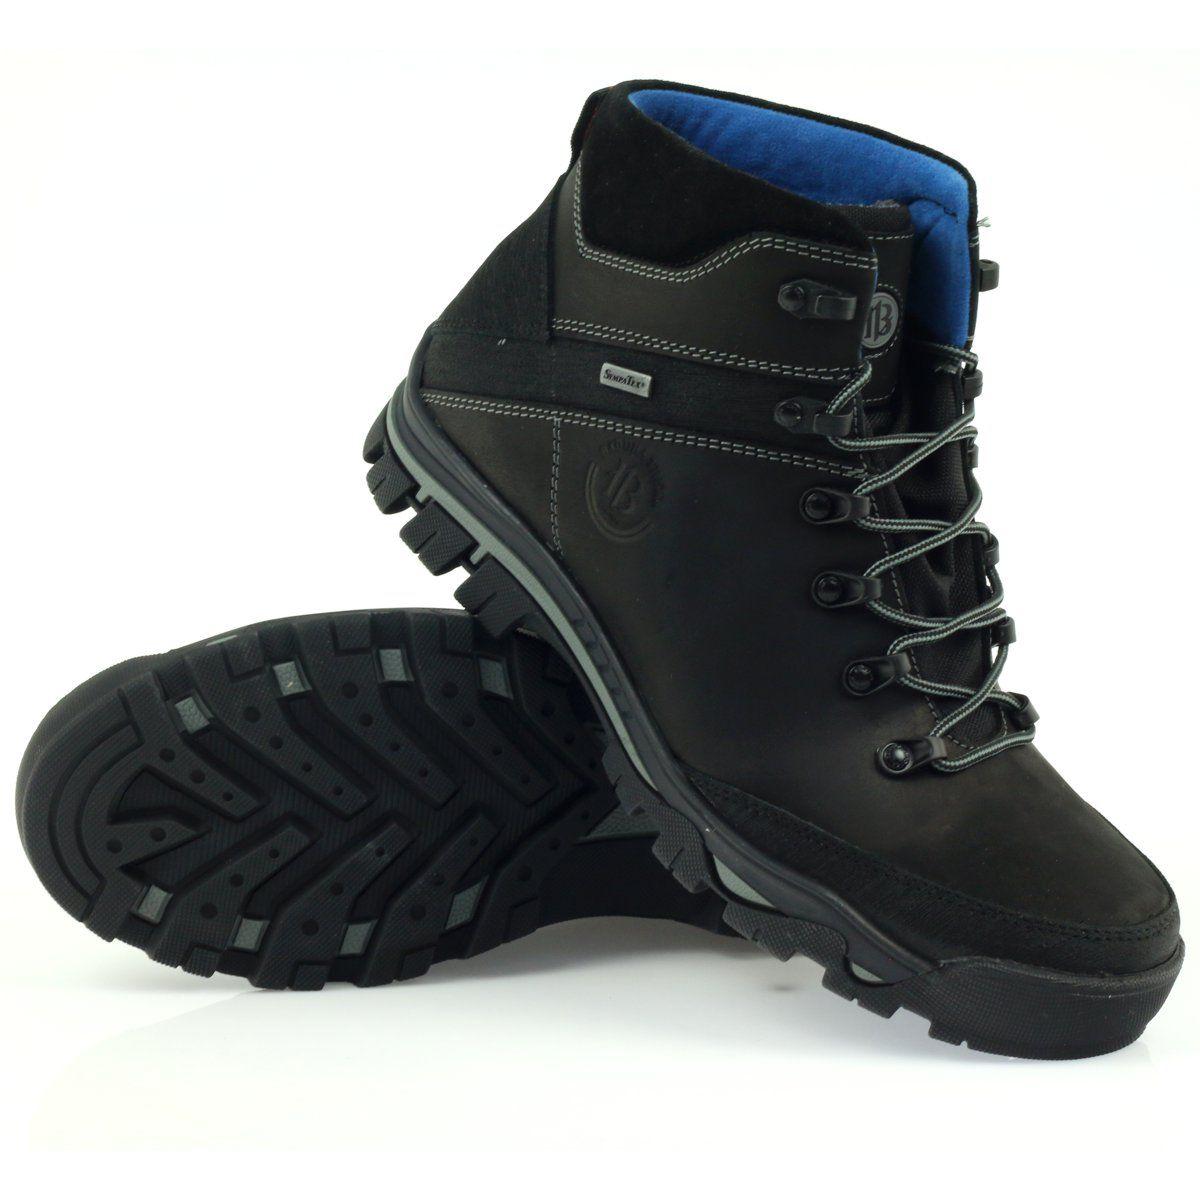 Trekkingi Z Membrana Czarne Badura 4616 Hiking Boots Boots Shoes